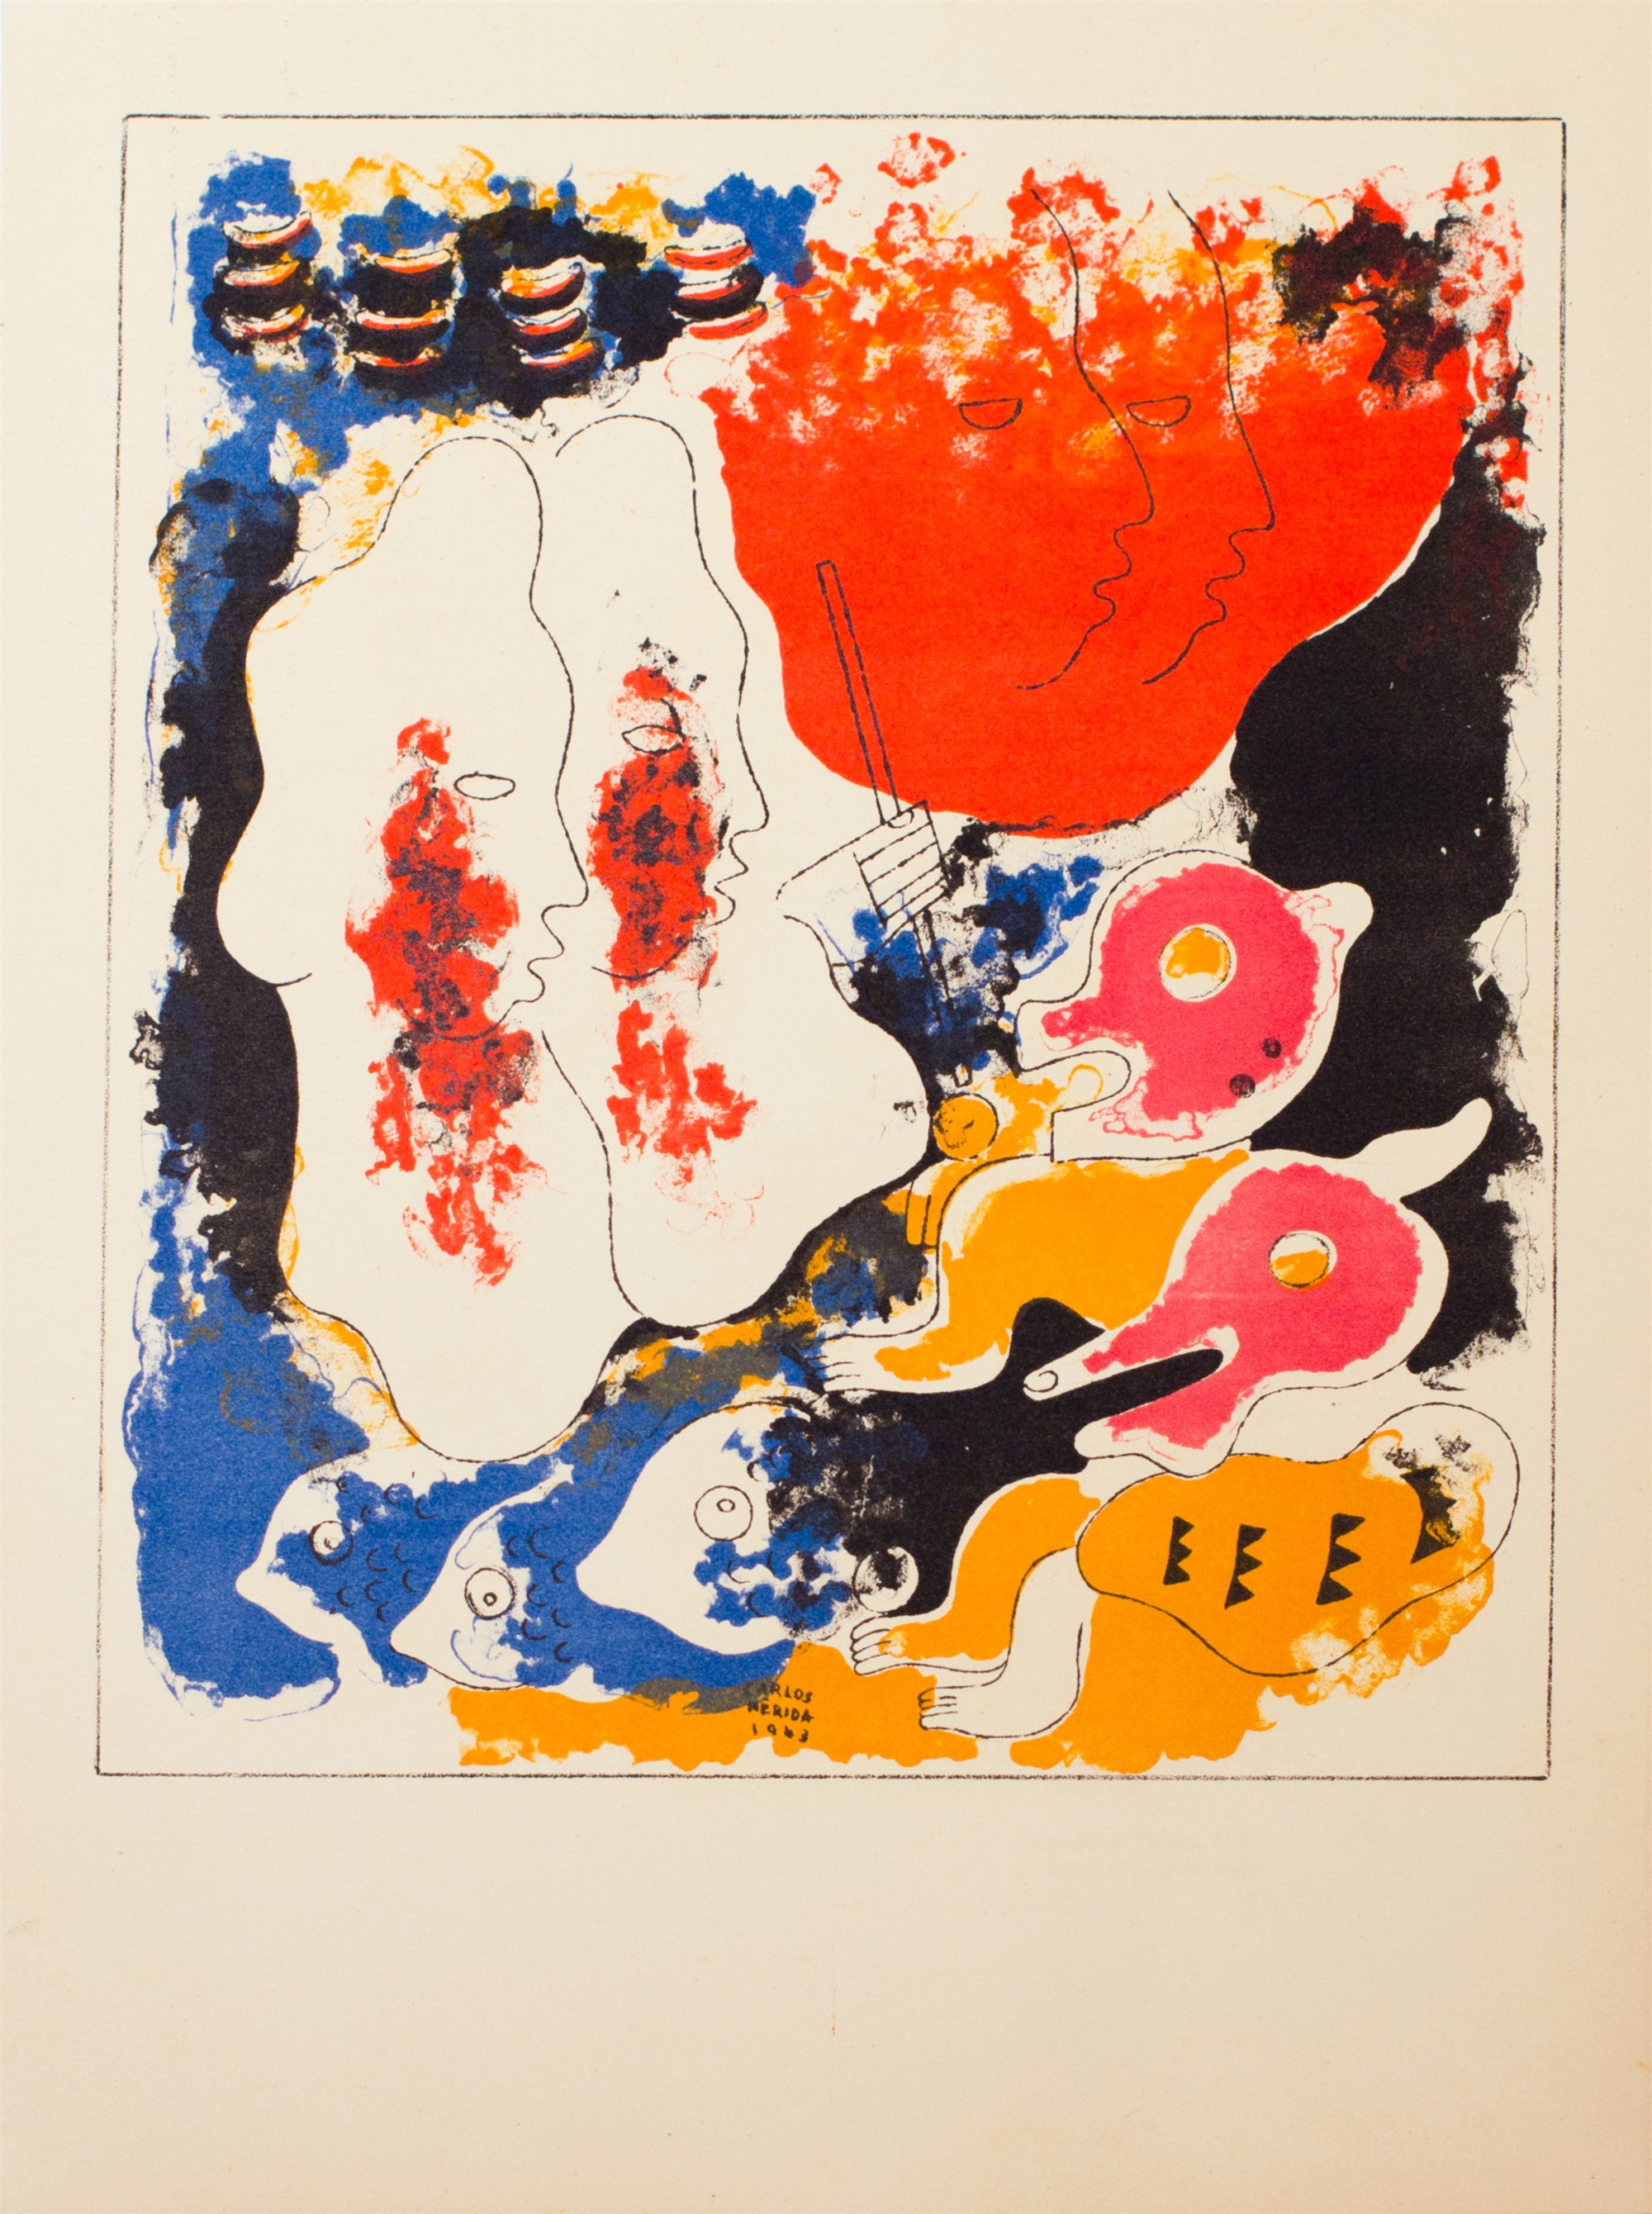 Estampas de Popol Vuh (Plate X) by Carlos Mérida (1891 - 1985)